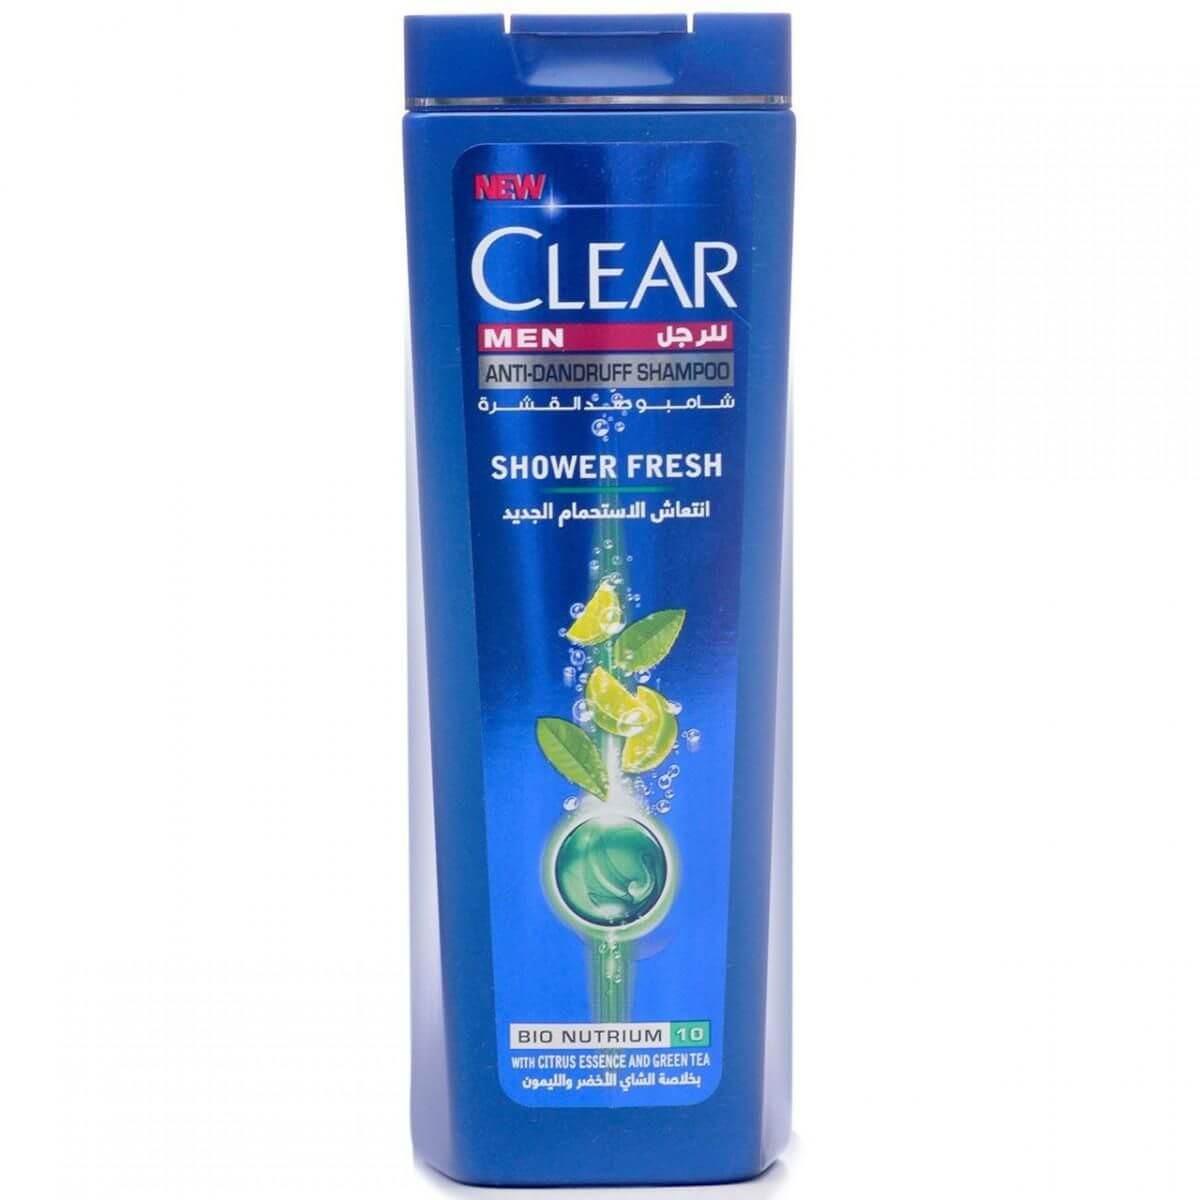 Clear Men AntiDandruff Shampoo Shower Fresh With Citrus Essence & Green Tea 200ml